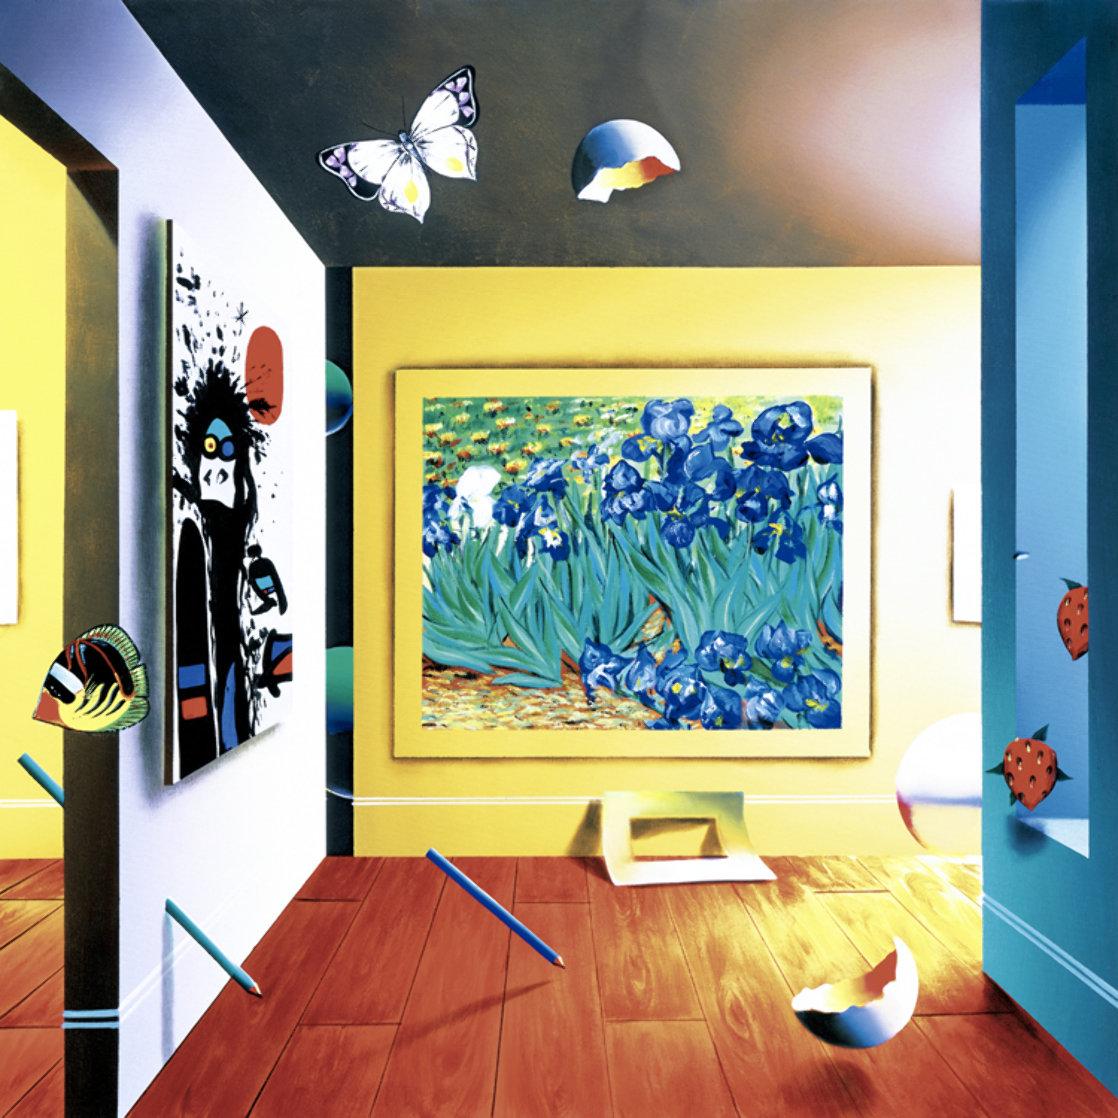 Homage to Van Gogh AP 2001 Limited Edition Print by (Fernando de Jesus Oliviera) Ferjo